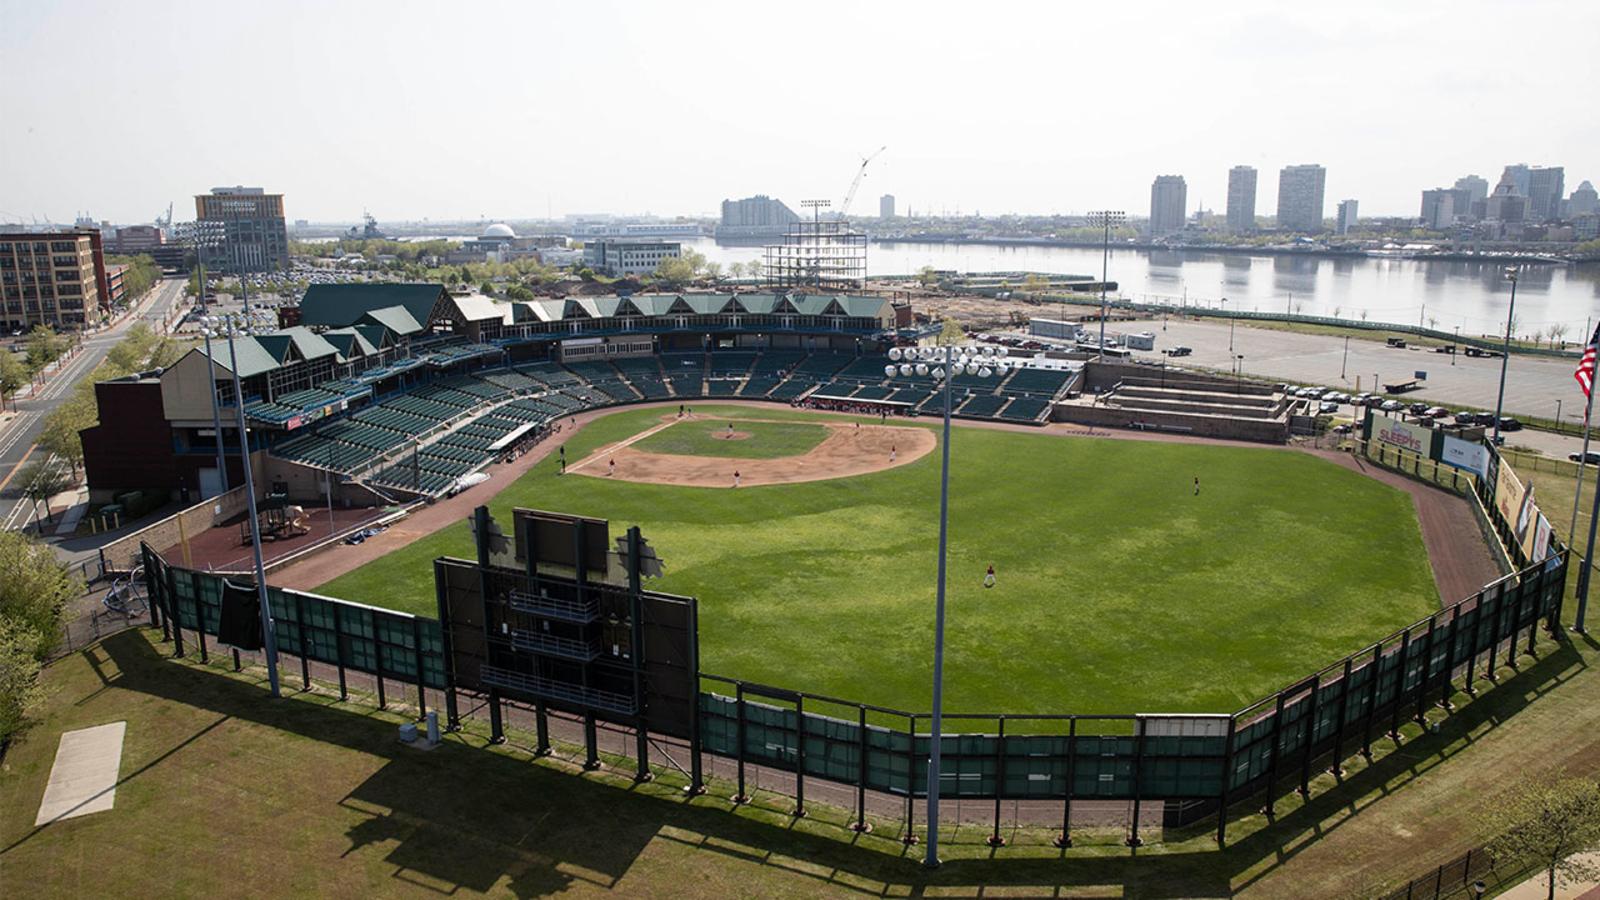 Camden's baseball stadium to be torn down, redeveloped ...